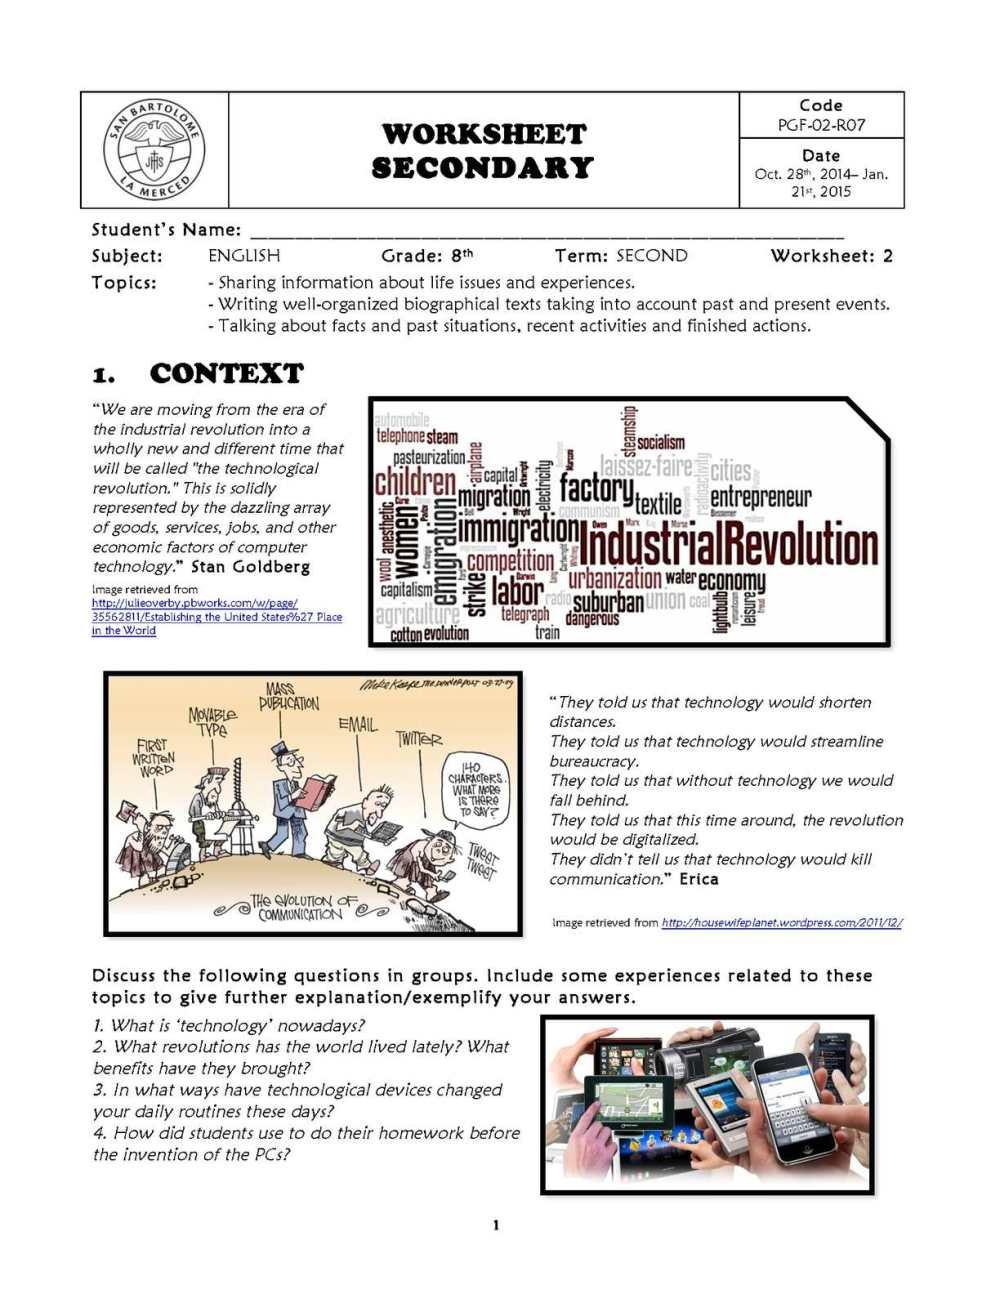 medium resolution of Calaméo - Worksheet No. 2 - 8th Grade